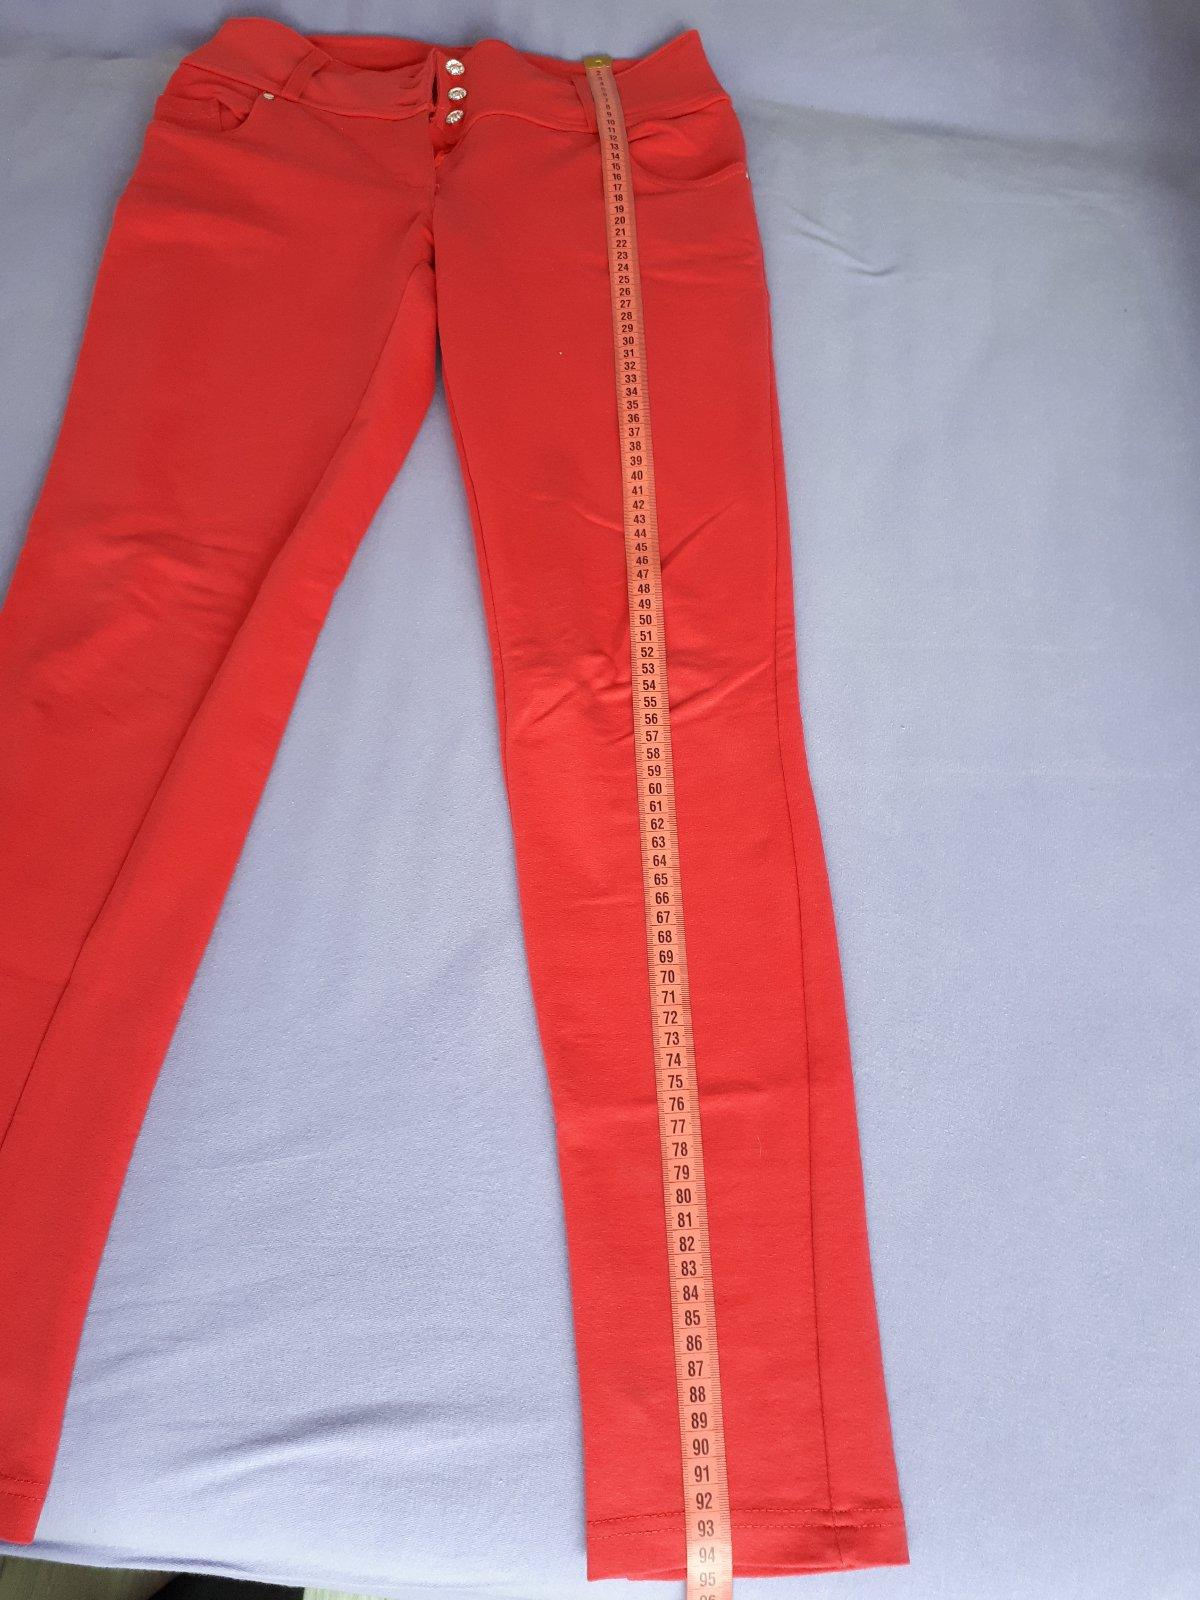 518ad76855d2 Damske nohavice pohodlne bavlnene